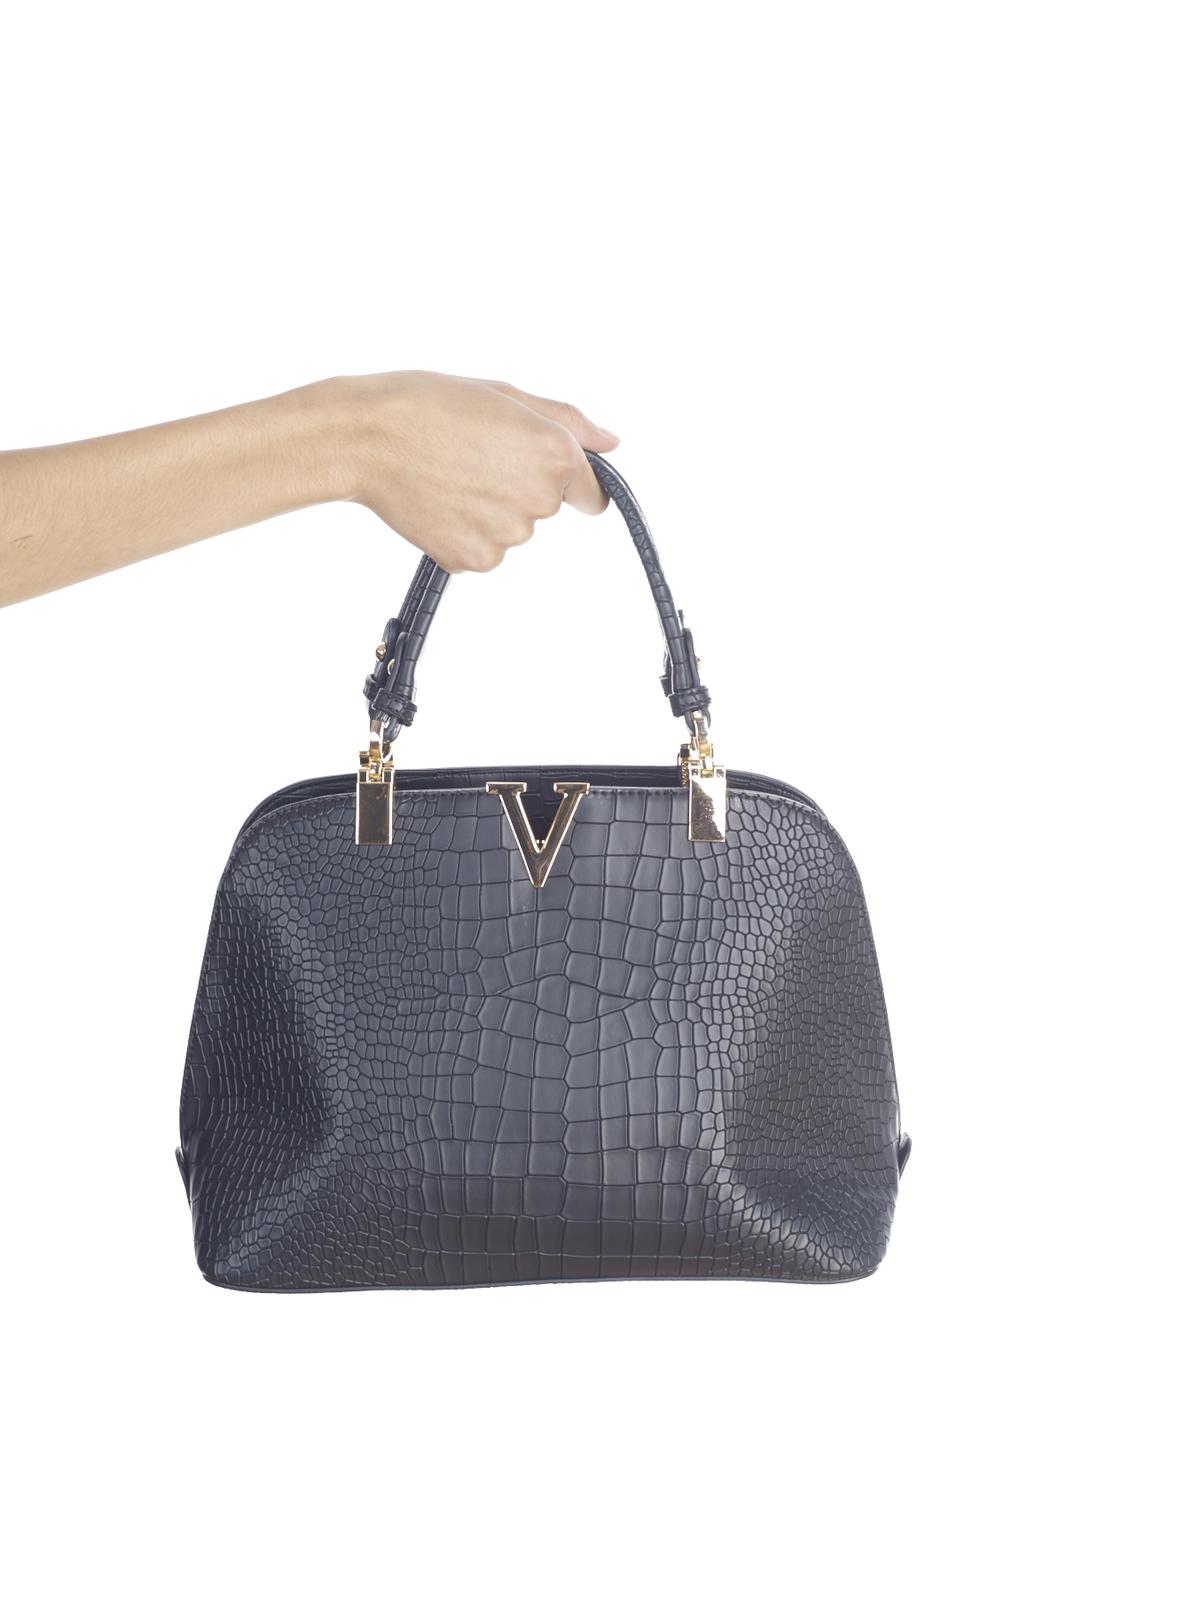 99.00$  Buy now - http://viryq.justgood.pw/vig/item.php?t=ade9qo10856 - #1184 Leather Bag, Black